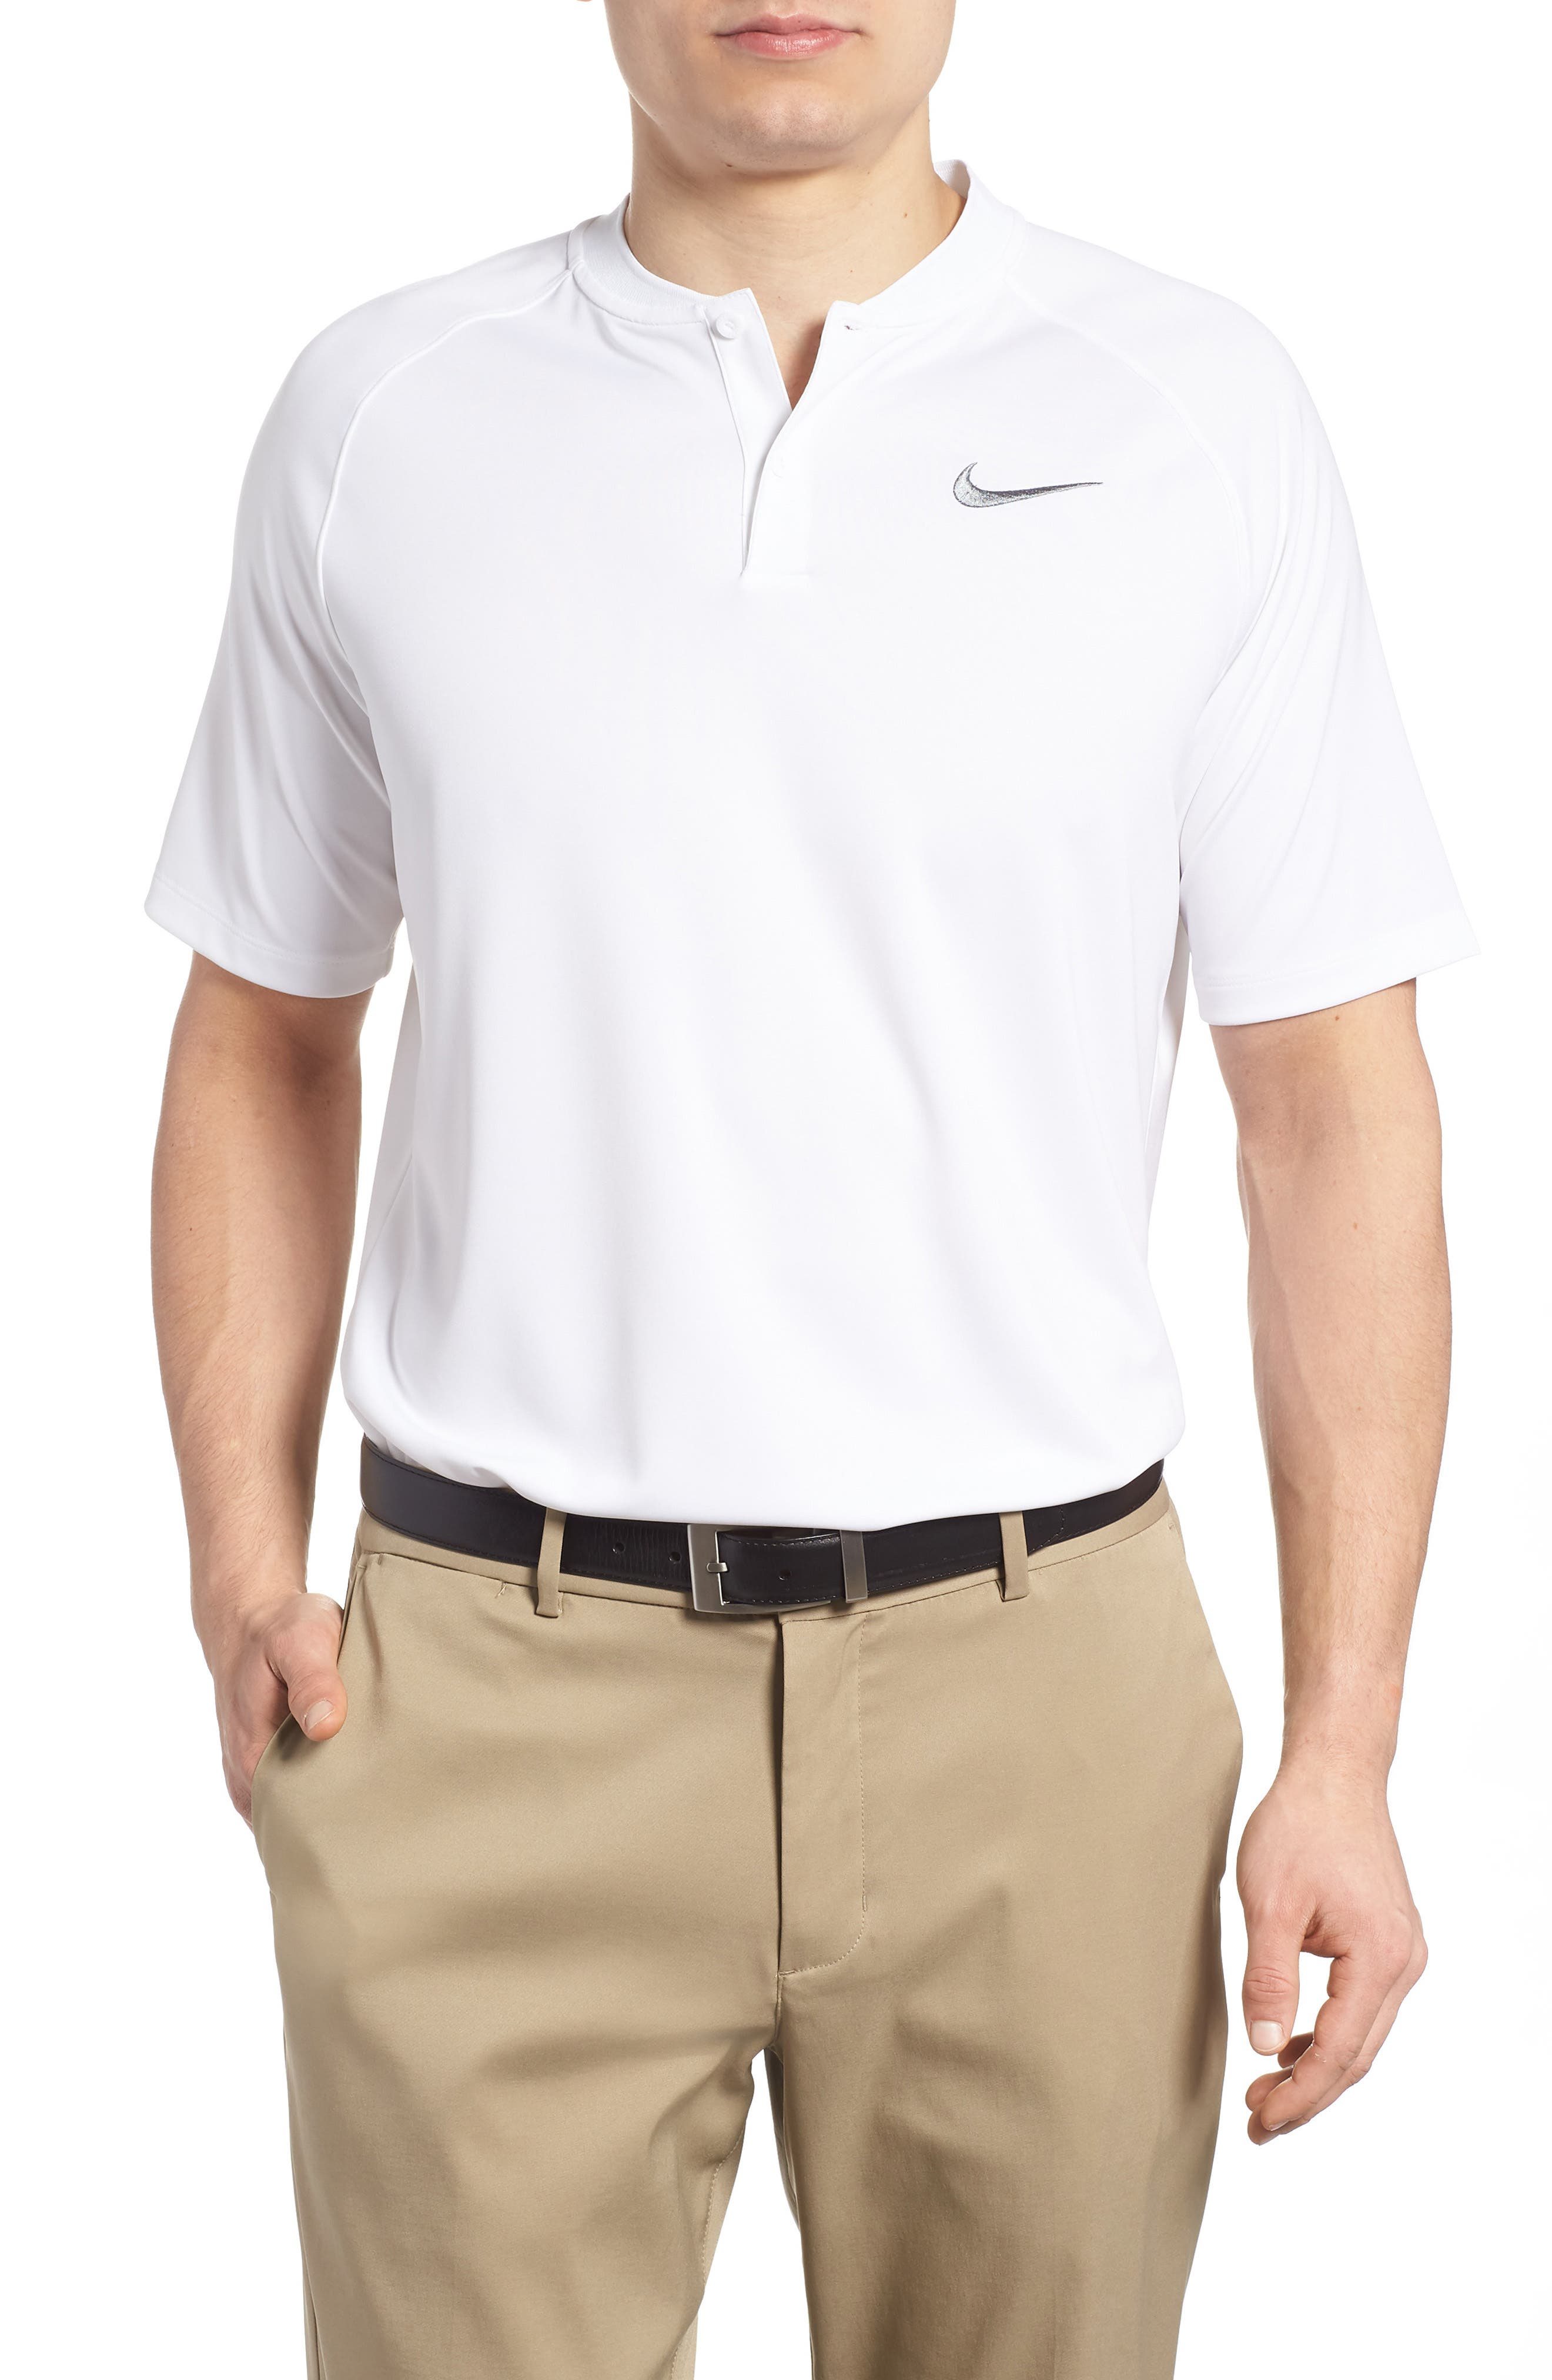 Dry Momentum Golf Polo,                         Main,                         color, White/ White/ Black